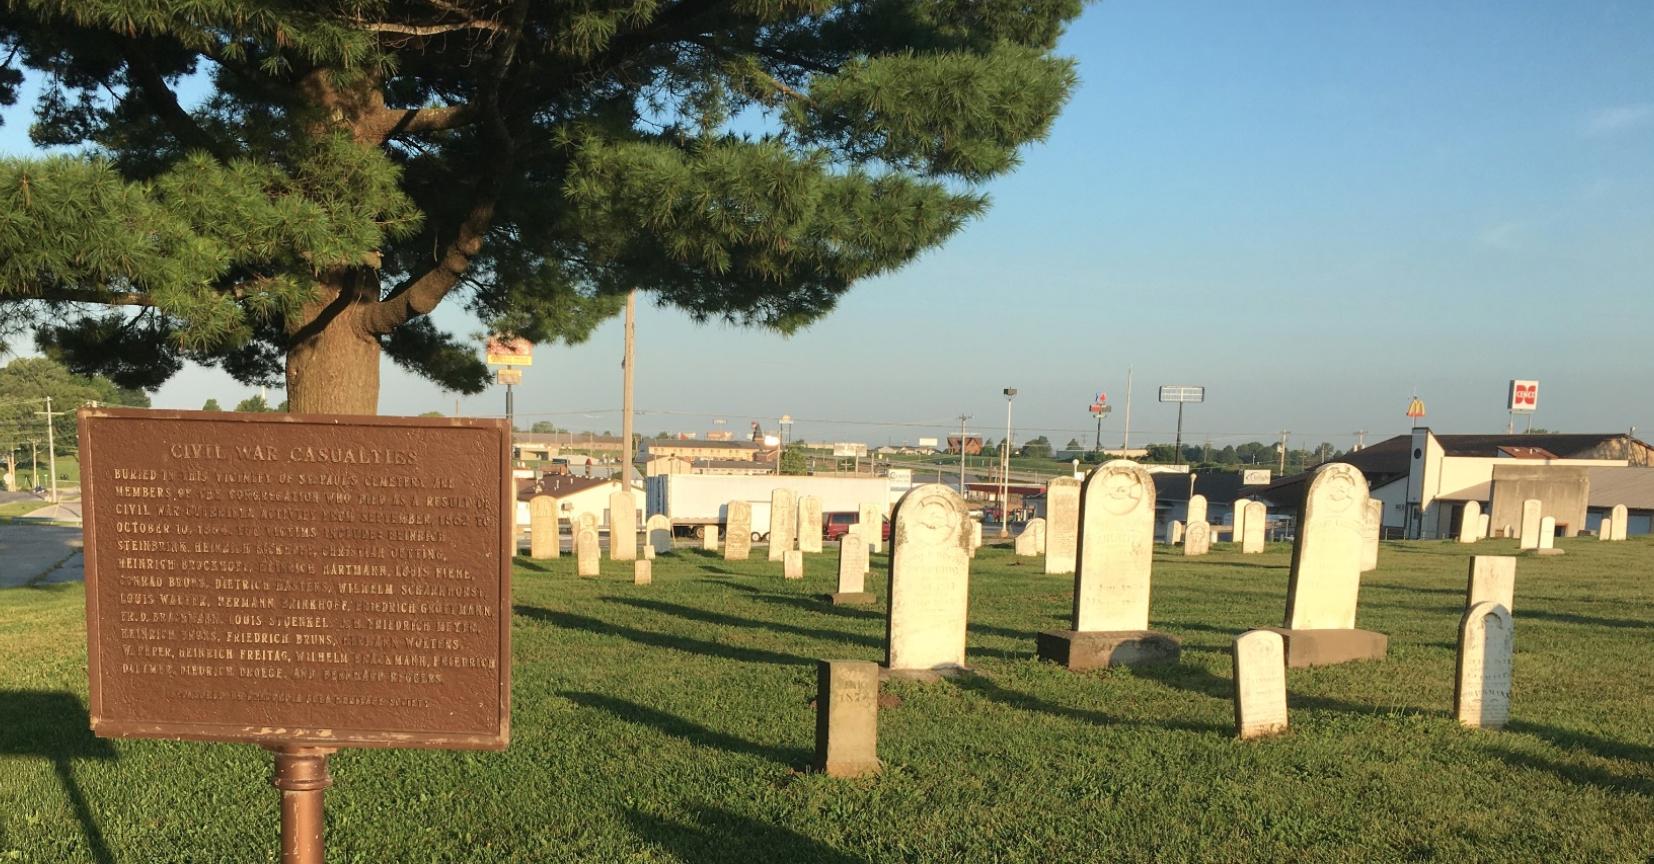 Civil War Casualties